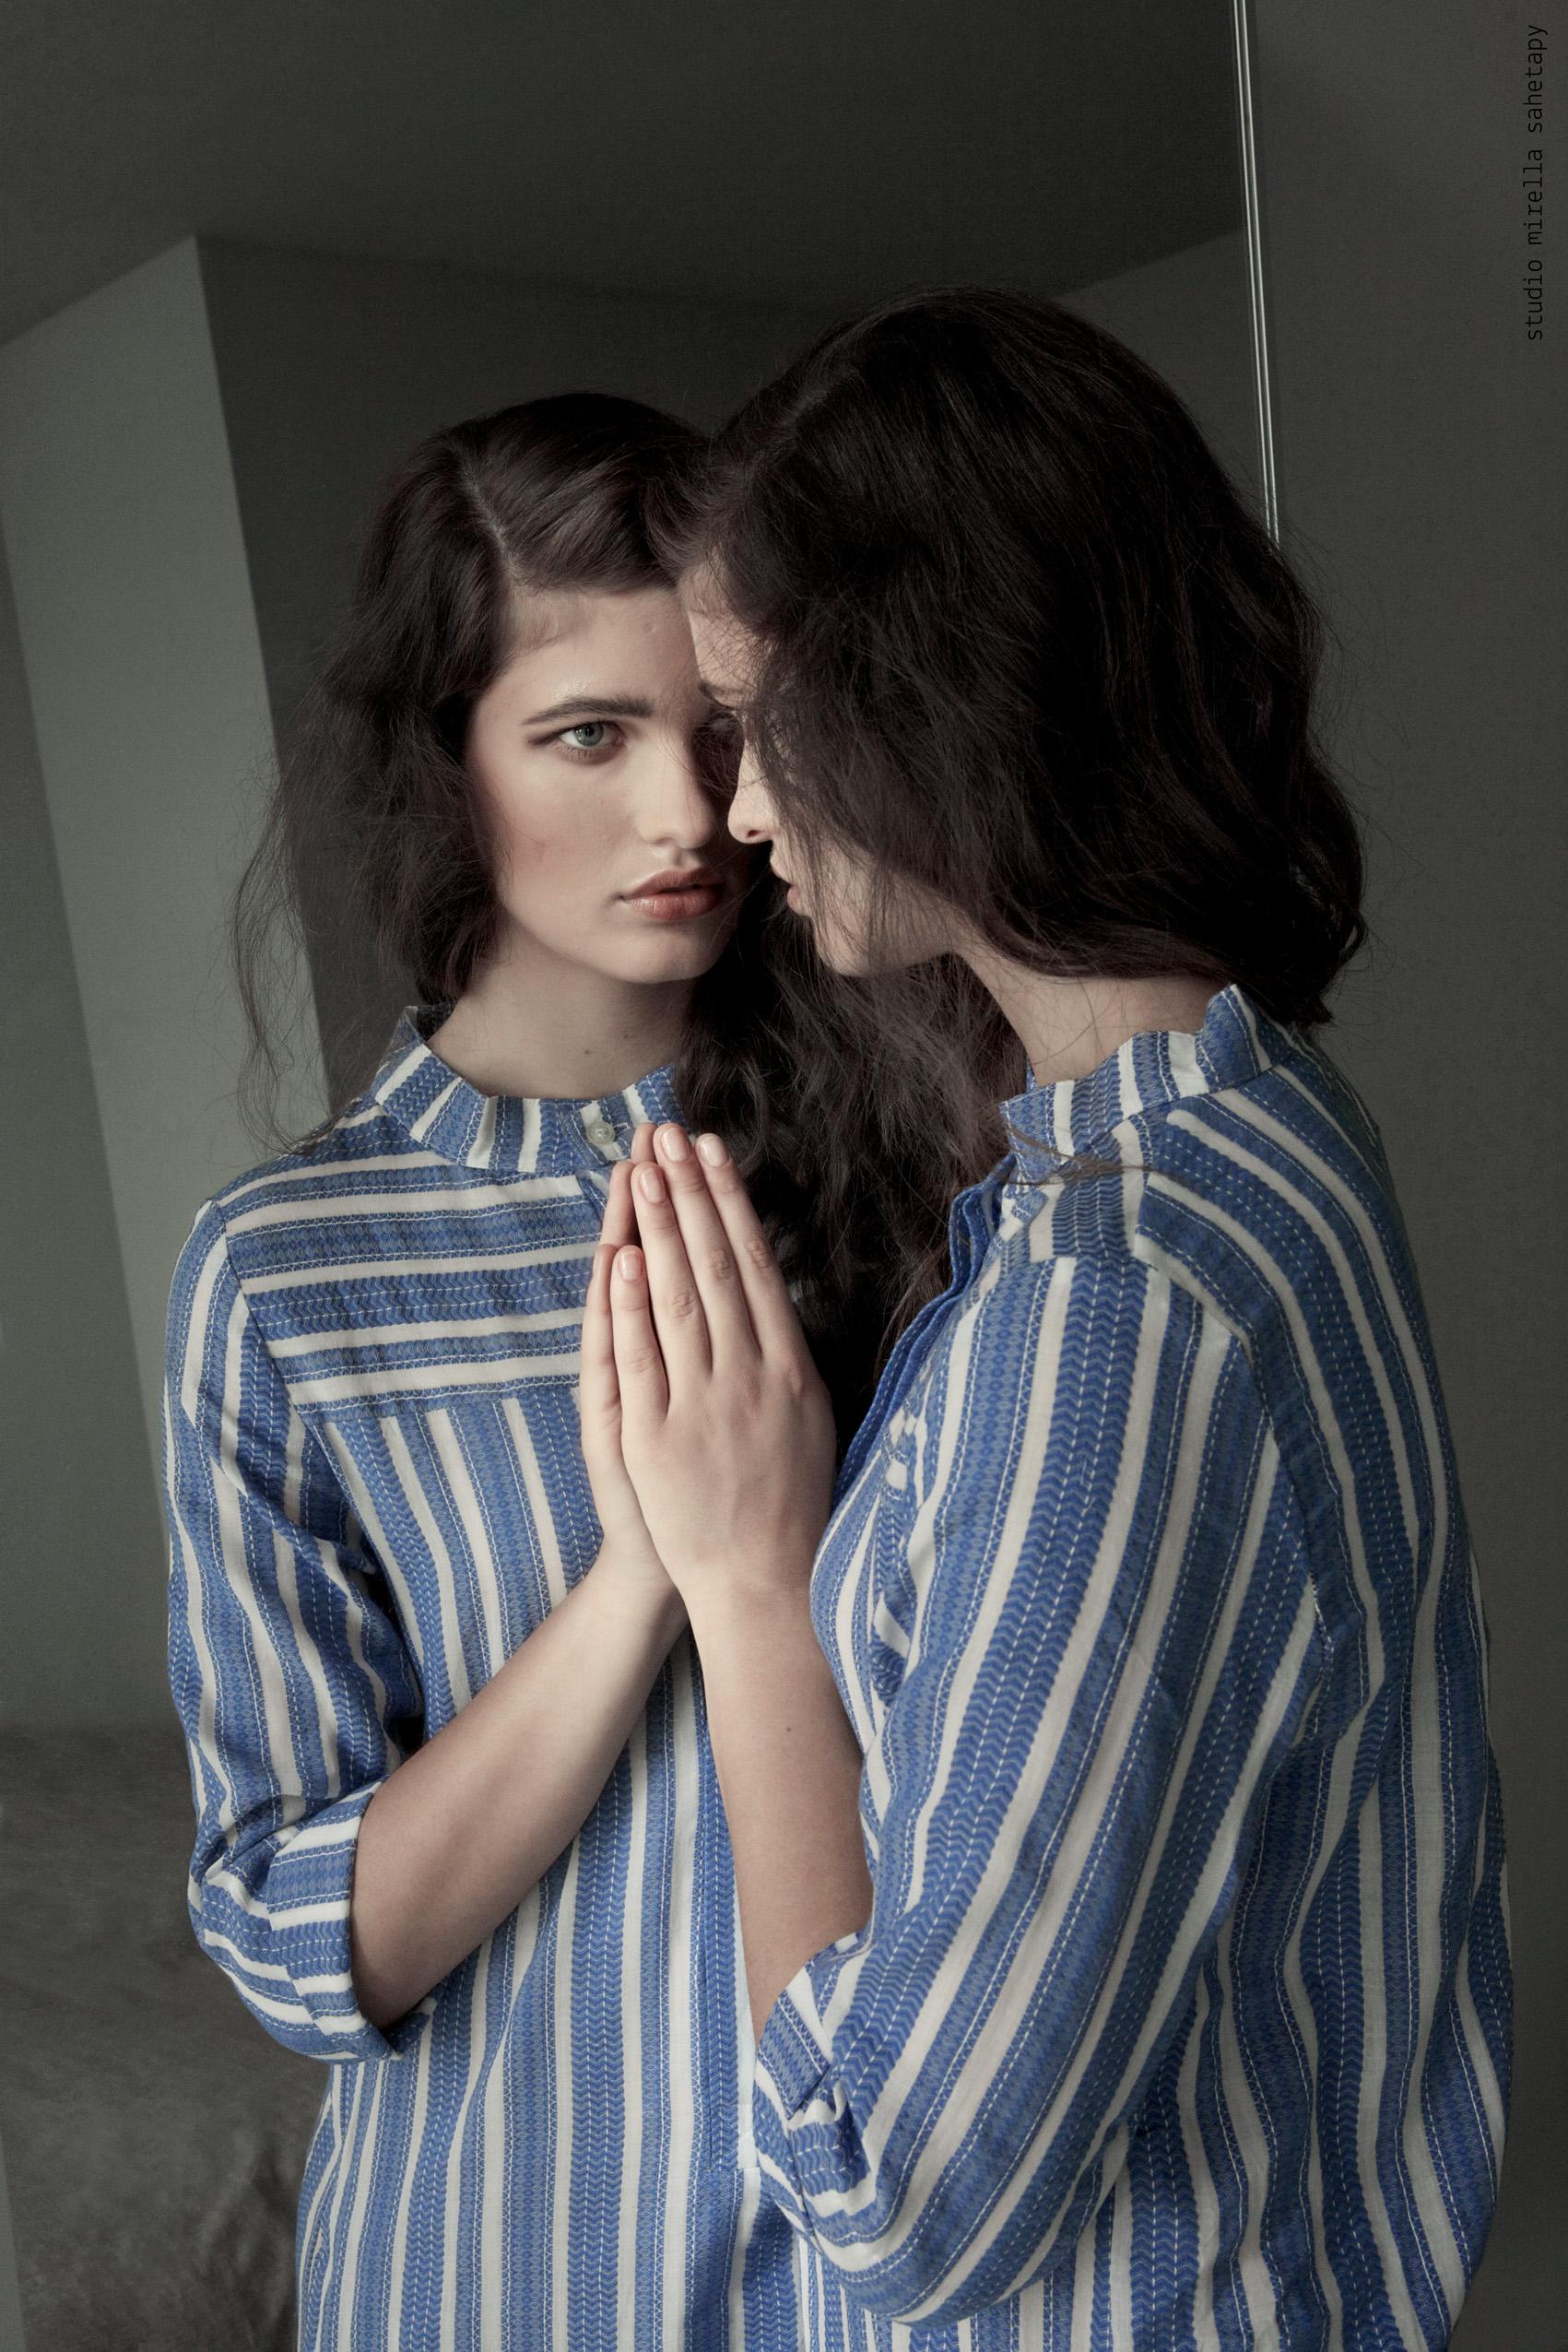 lxd-mirror-01